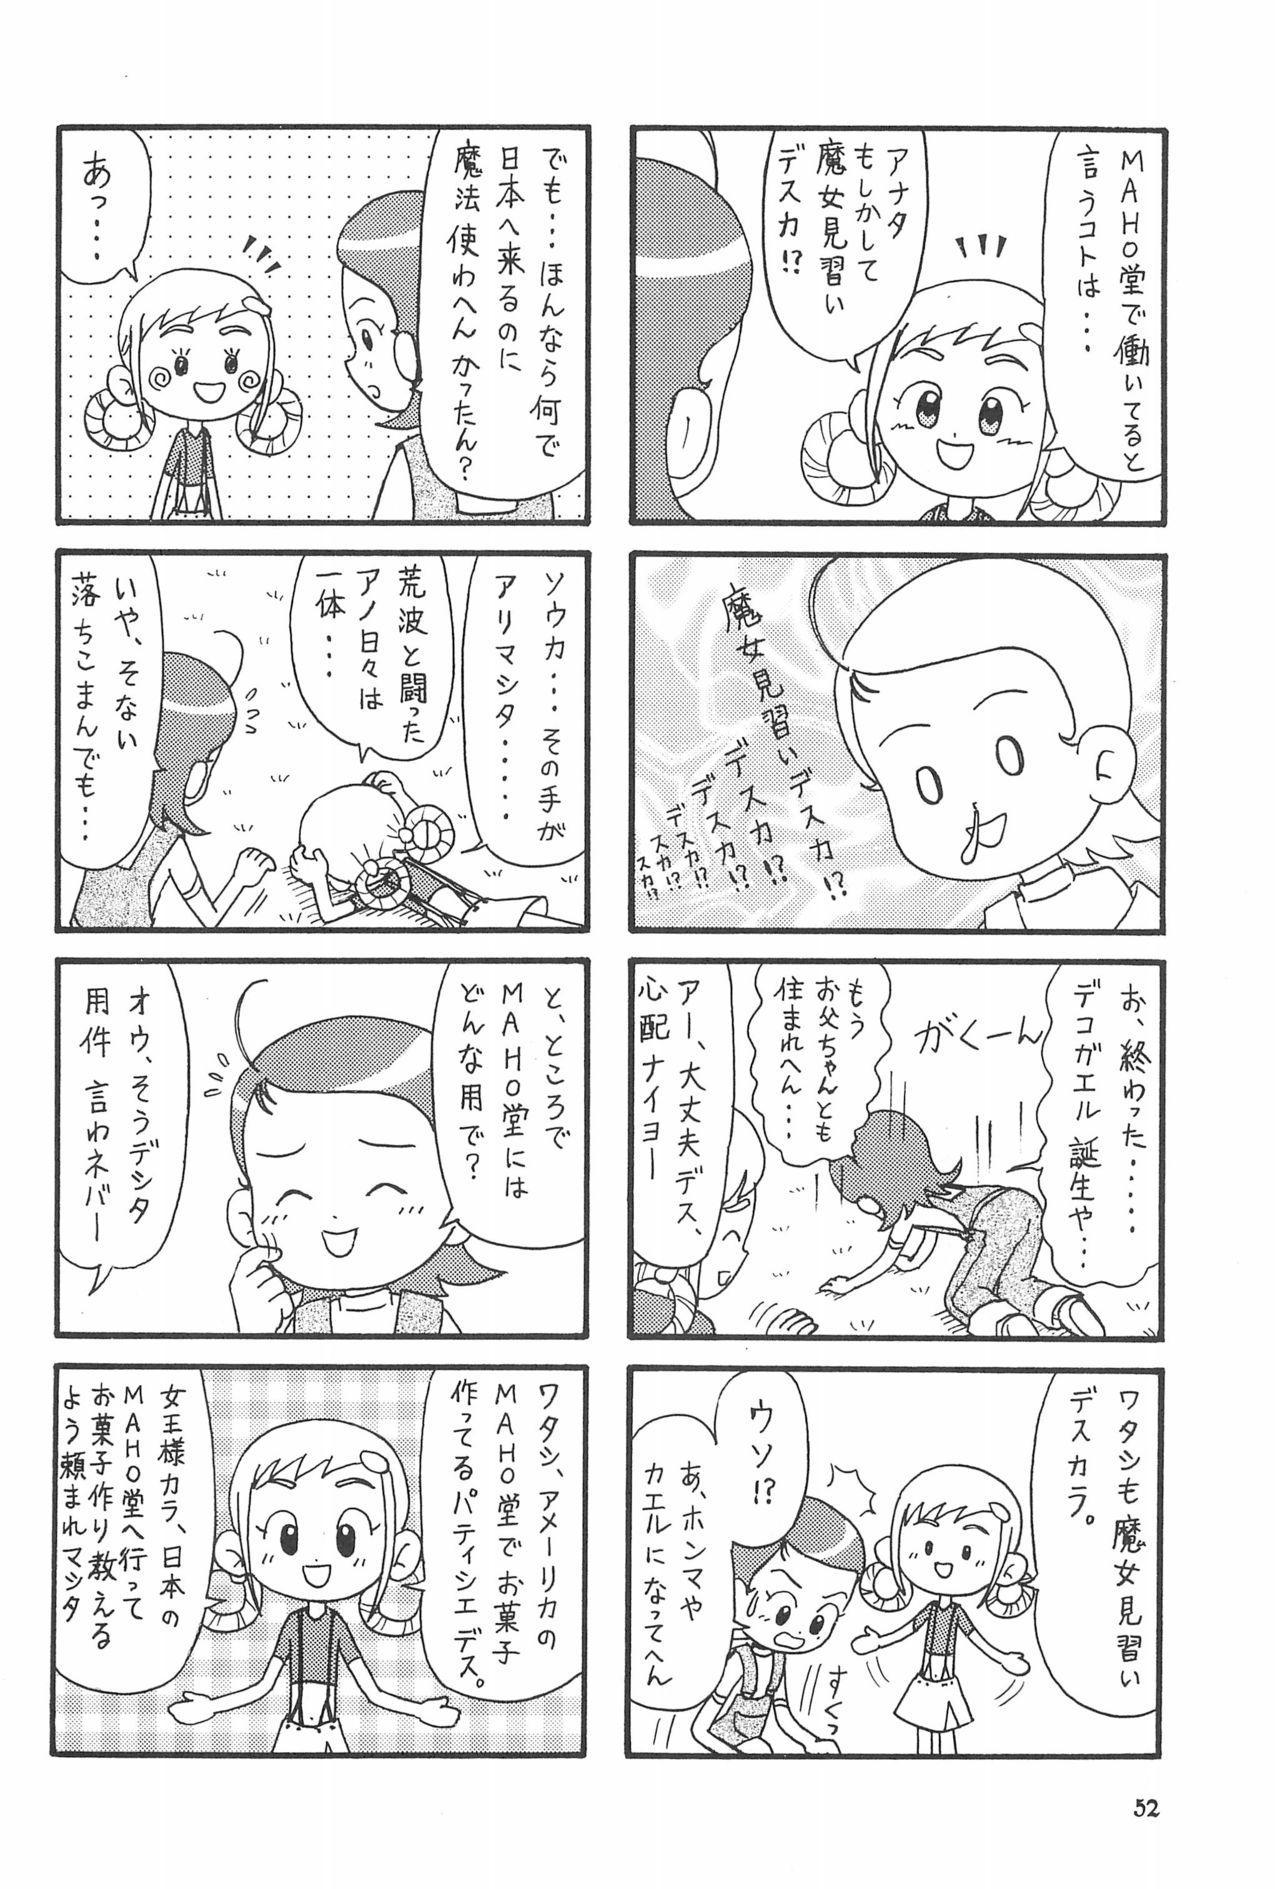 Momo no Kanzume 51